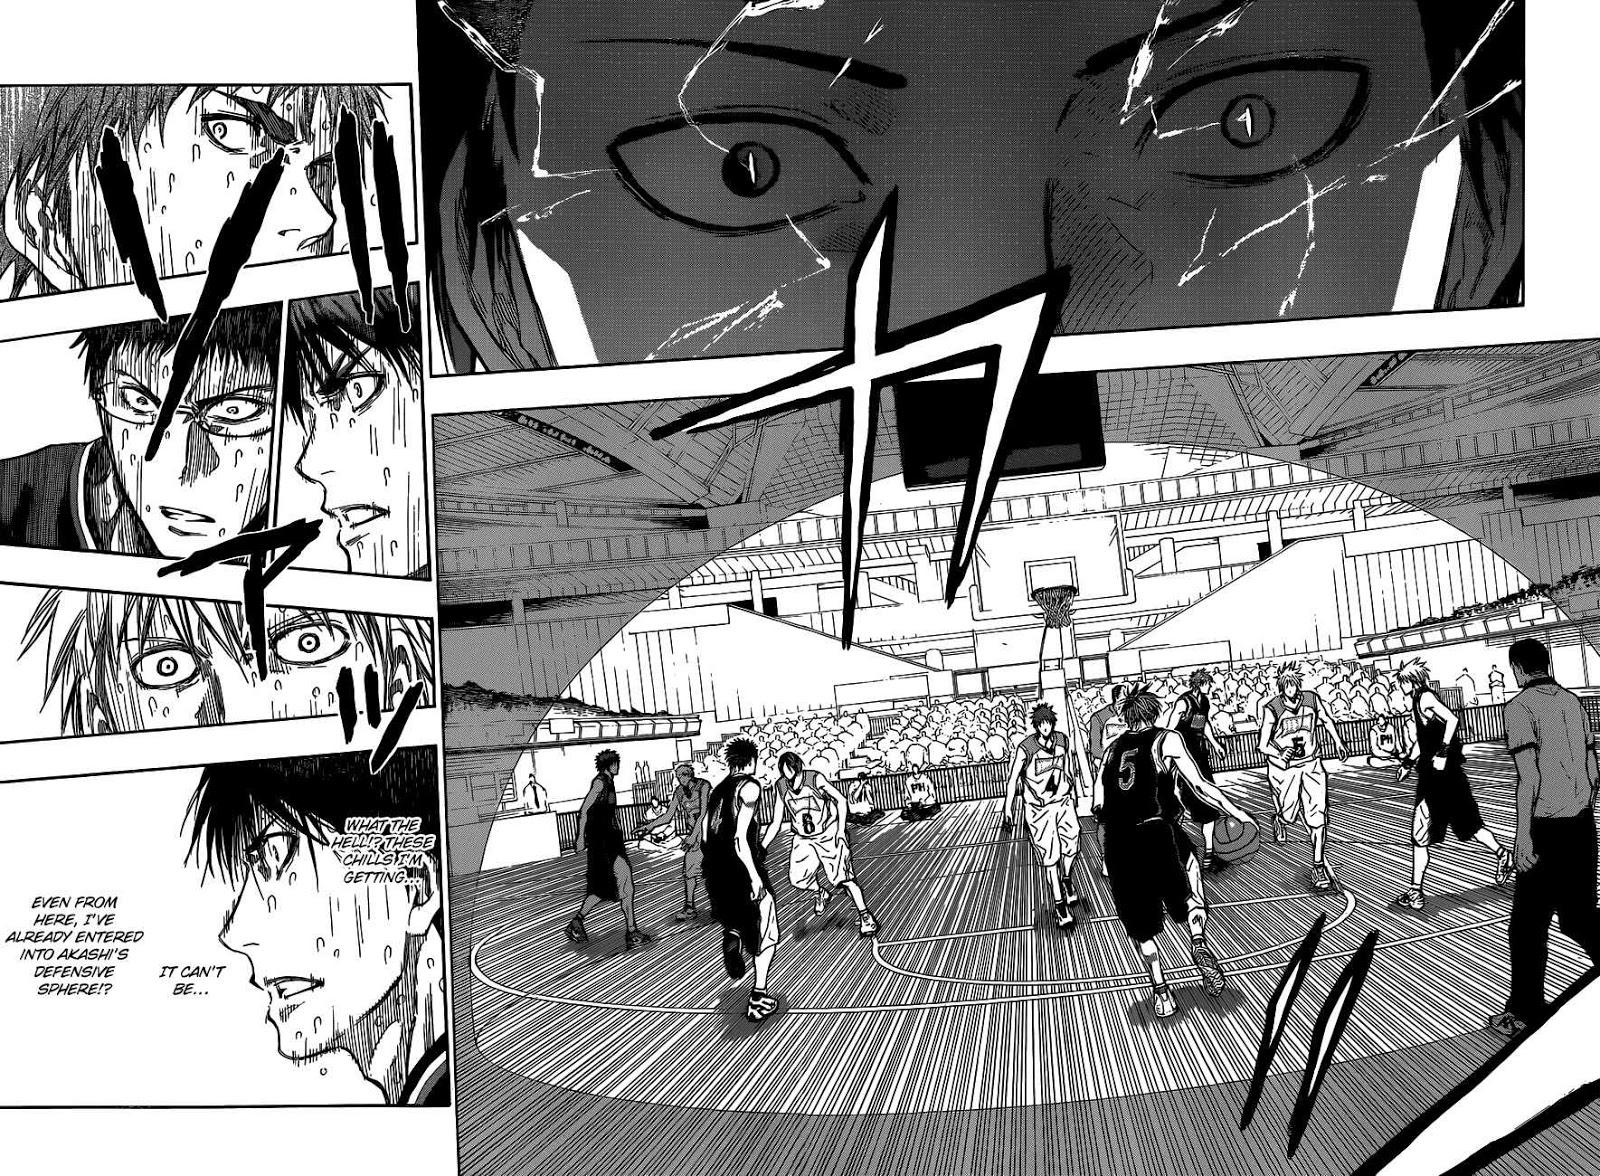 Kuroko no Basket Manga Chapter 262 - Image 04-05